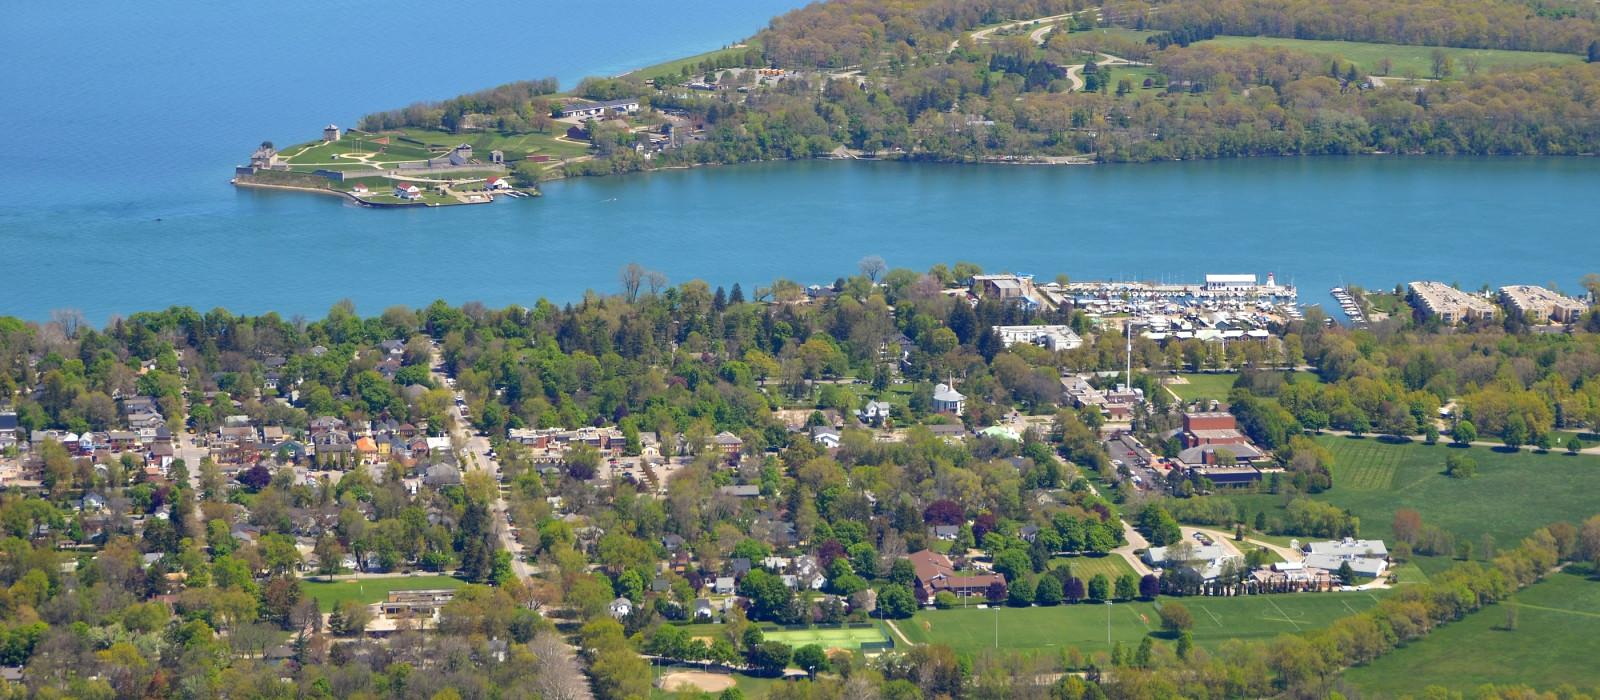 Destination Niagara-on-the-Lake Canada